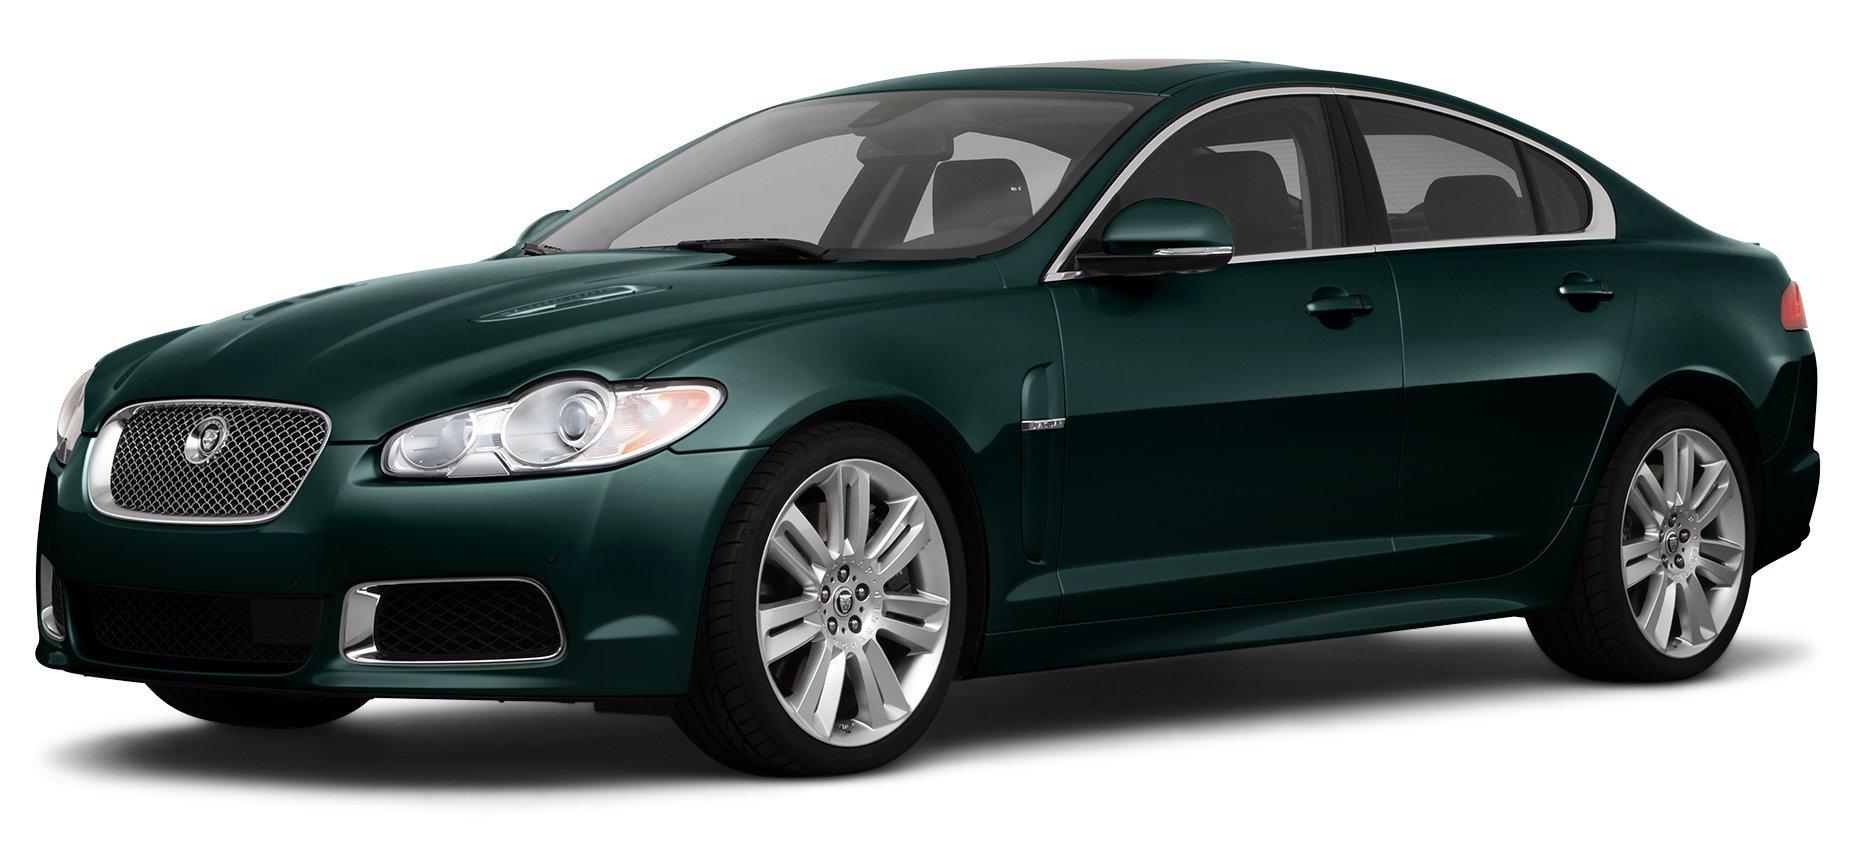 2010 Jaguar XFR, 4 Door Sedan